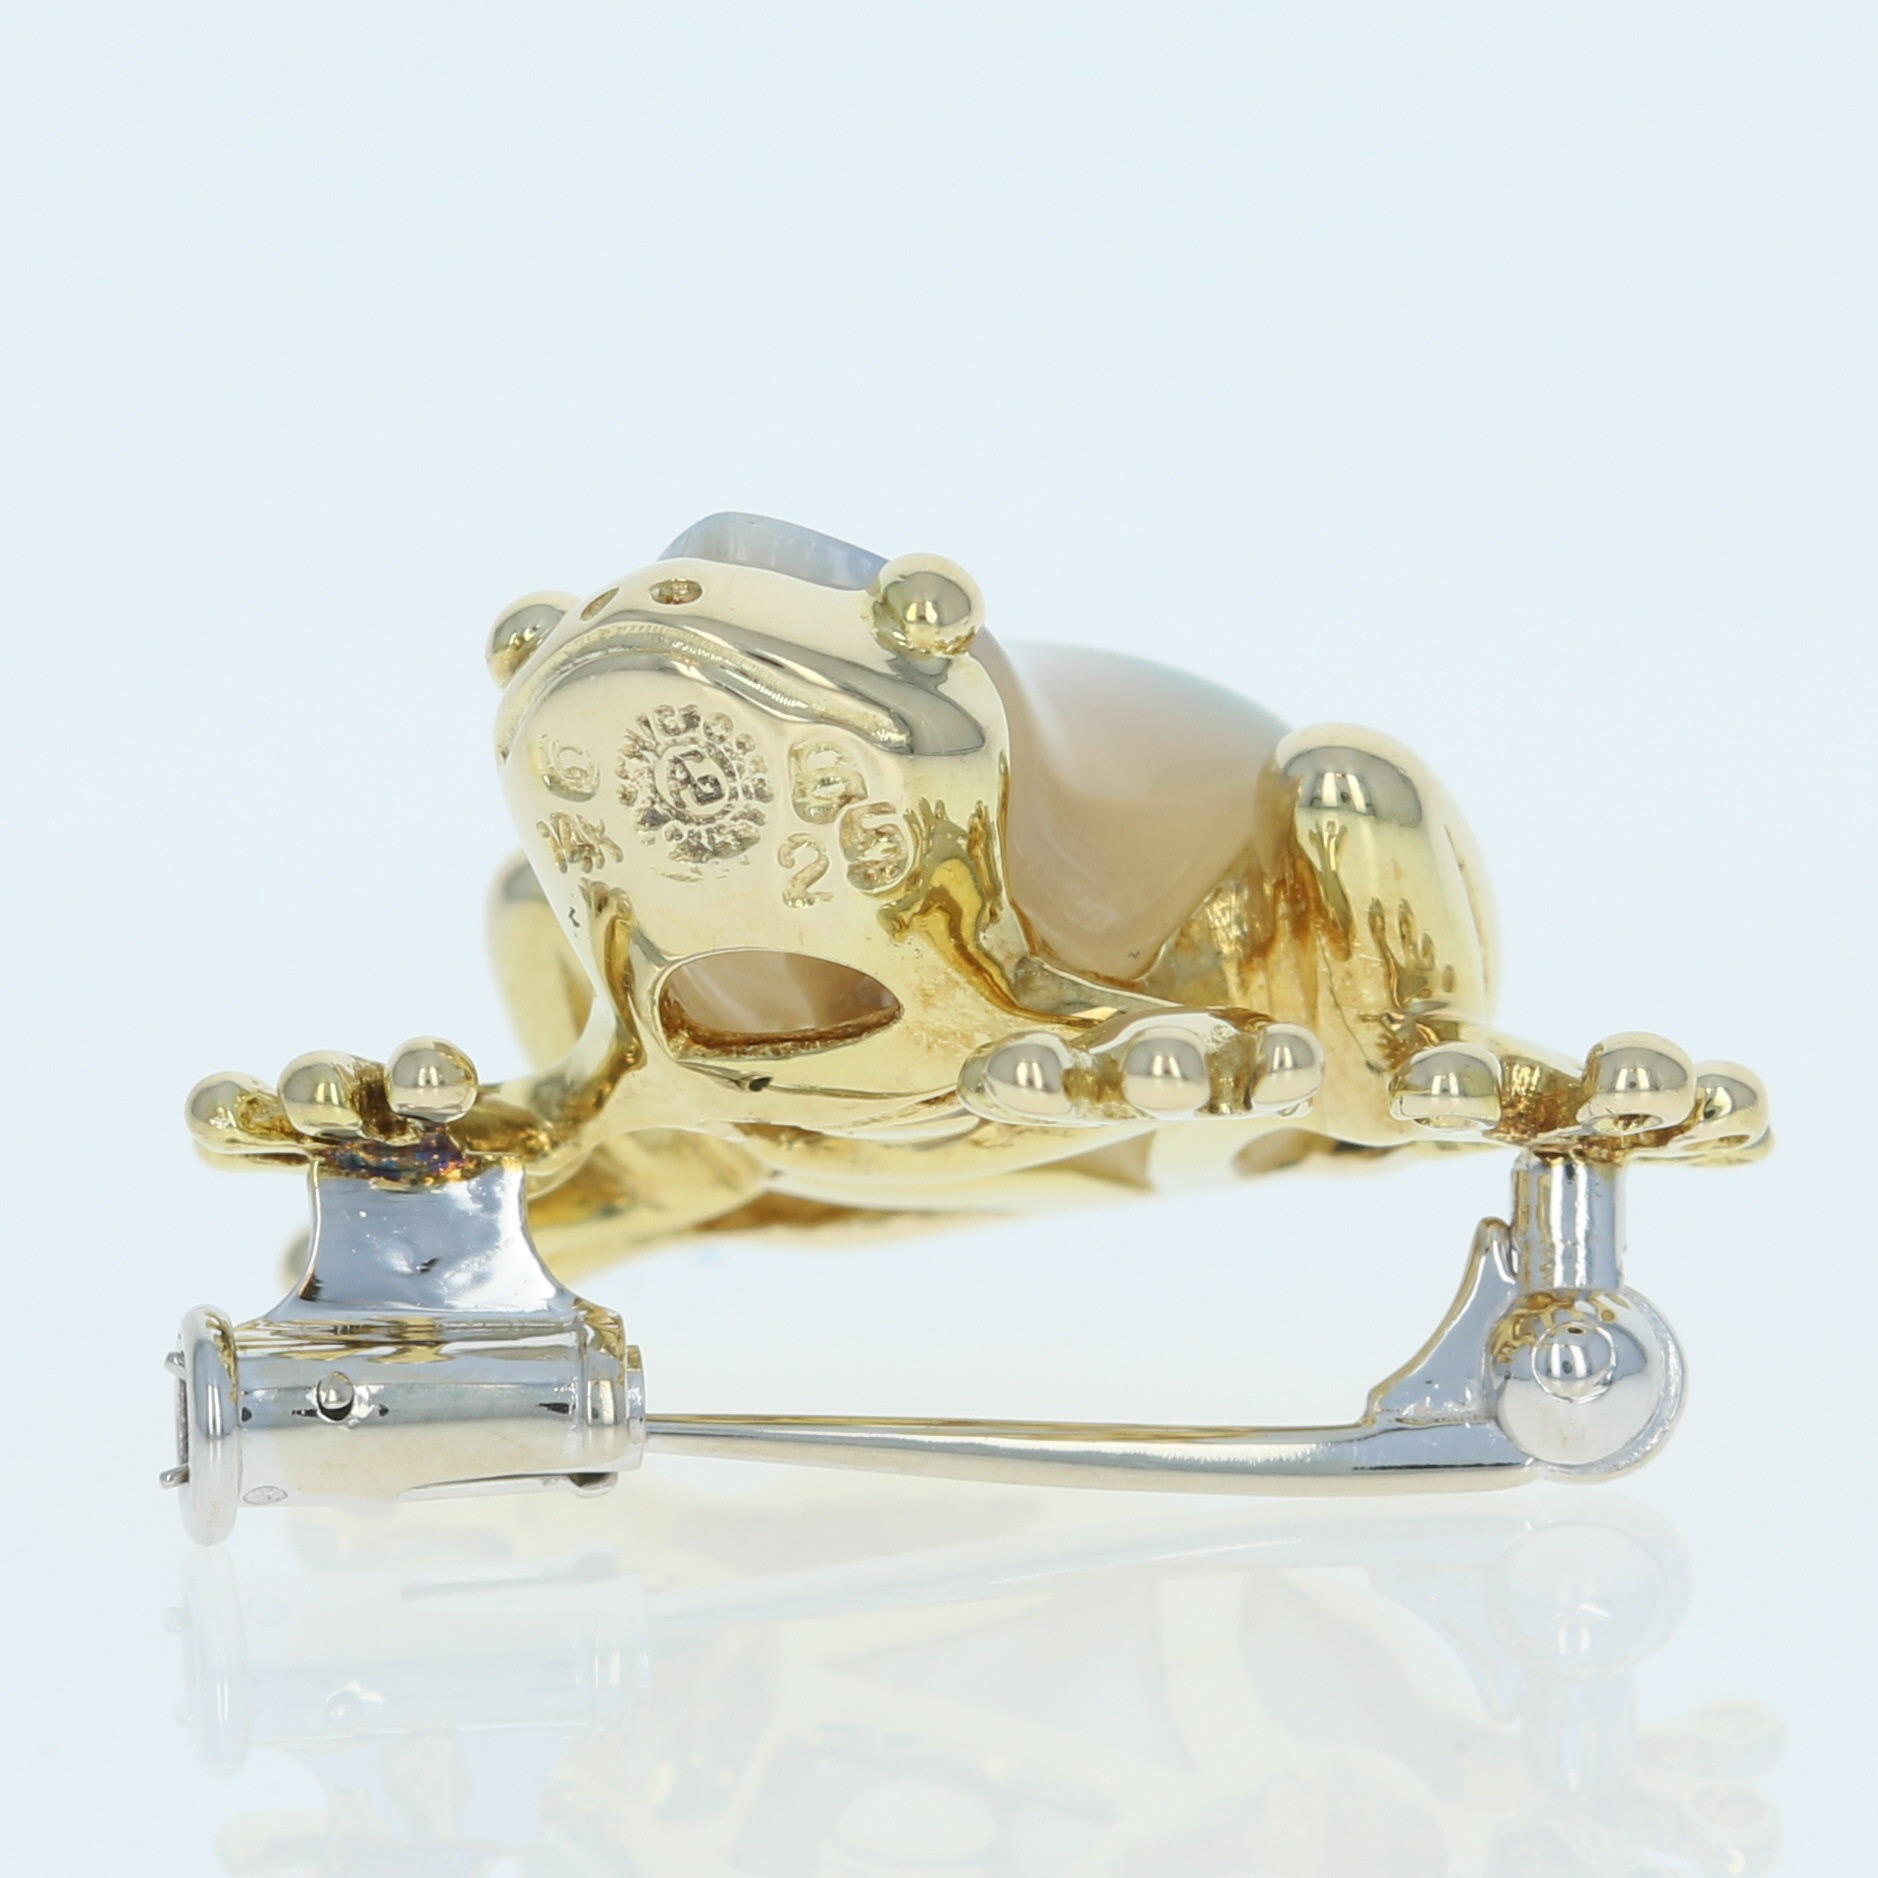 chaussures d'automne grande remise nouveau sélection Details about Mother of Pearl, Lapis, Coral, & Malachite Asch Grossbardt  Frog Brooch 14k Gold